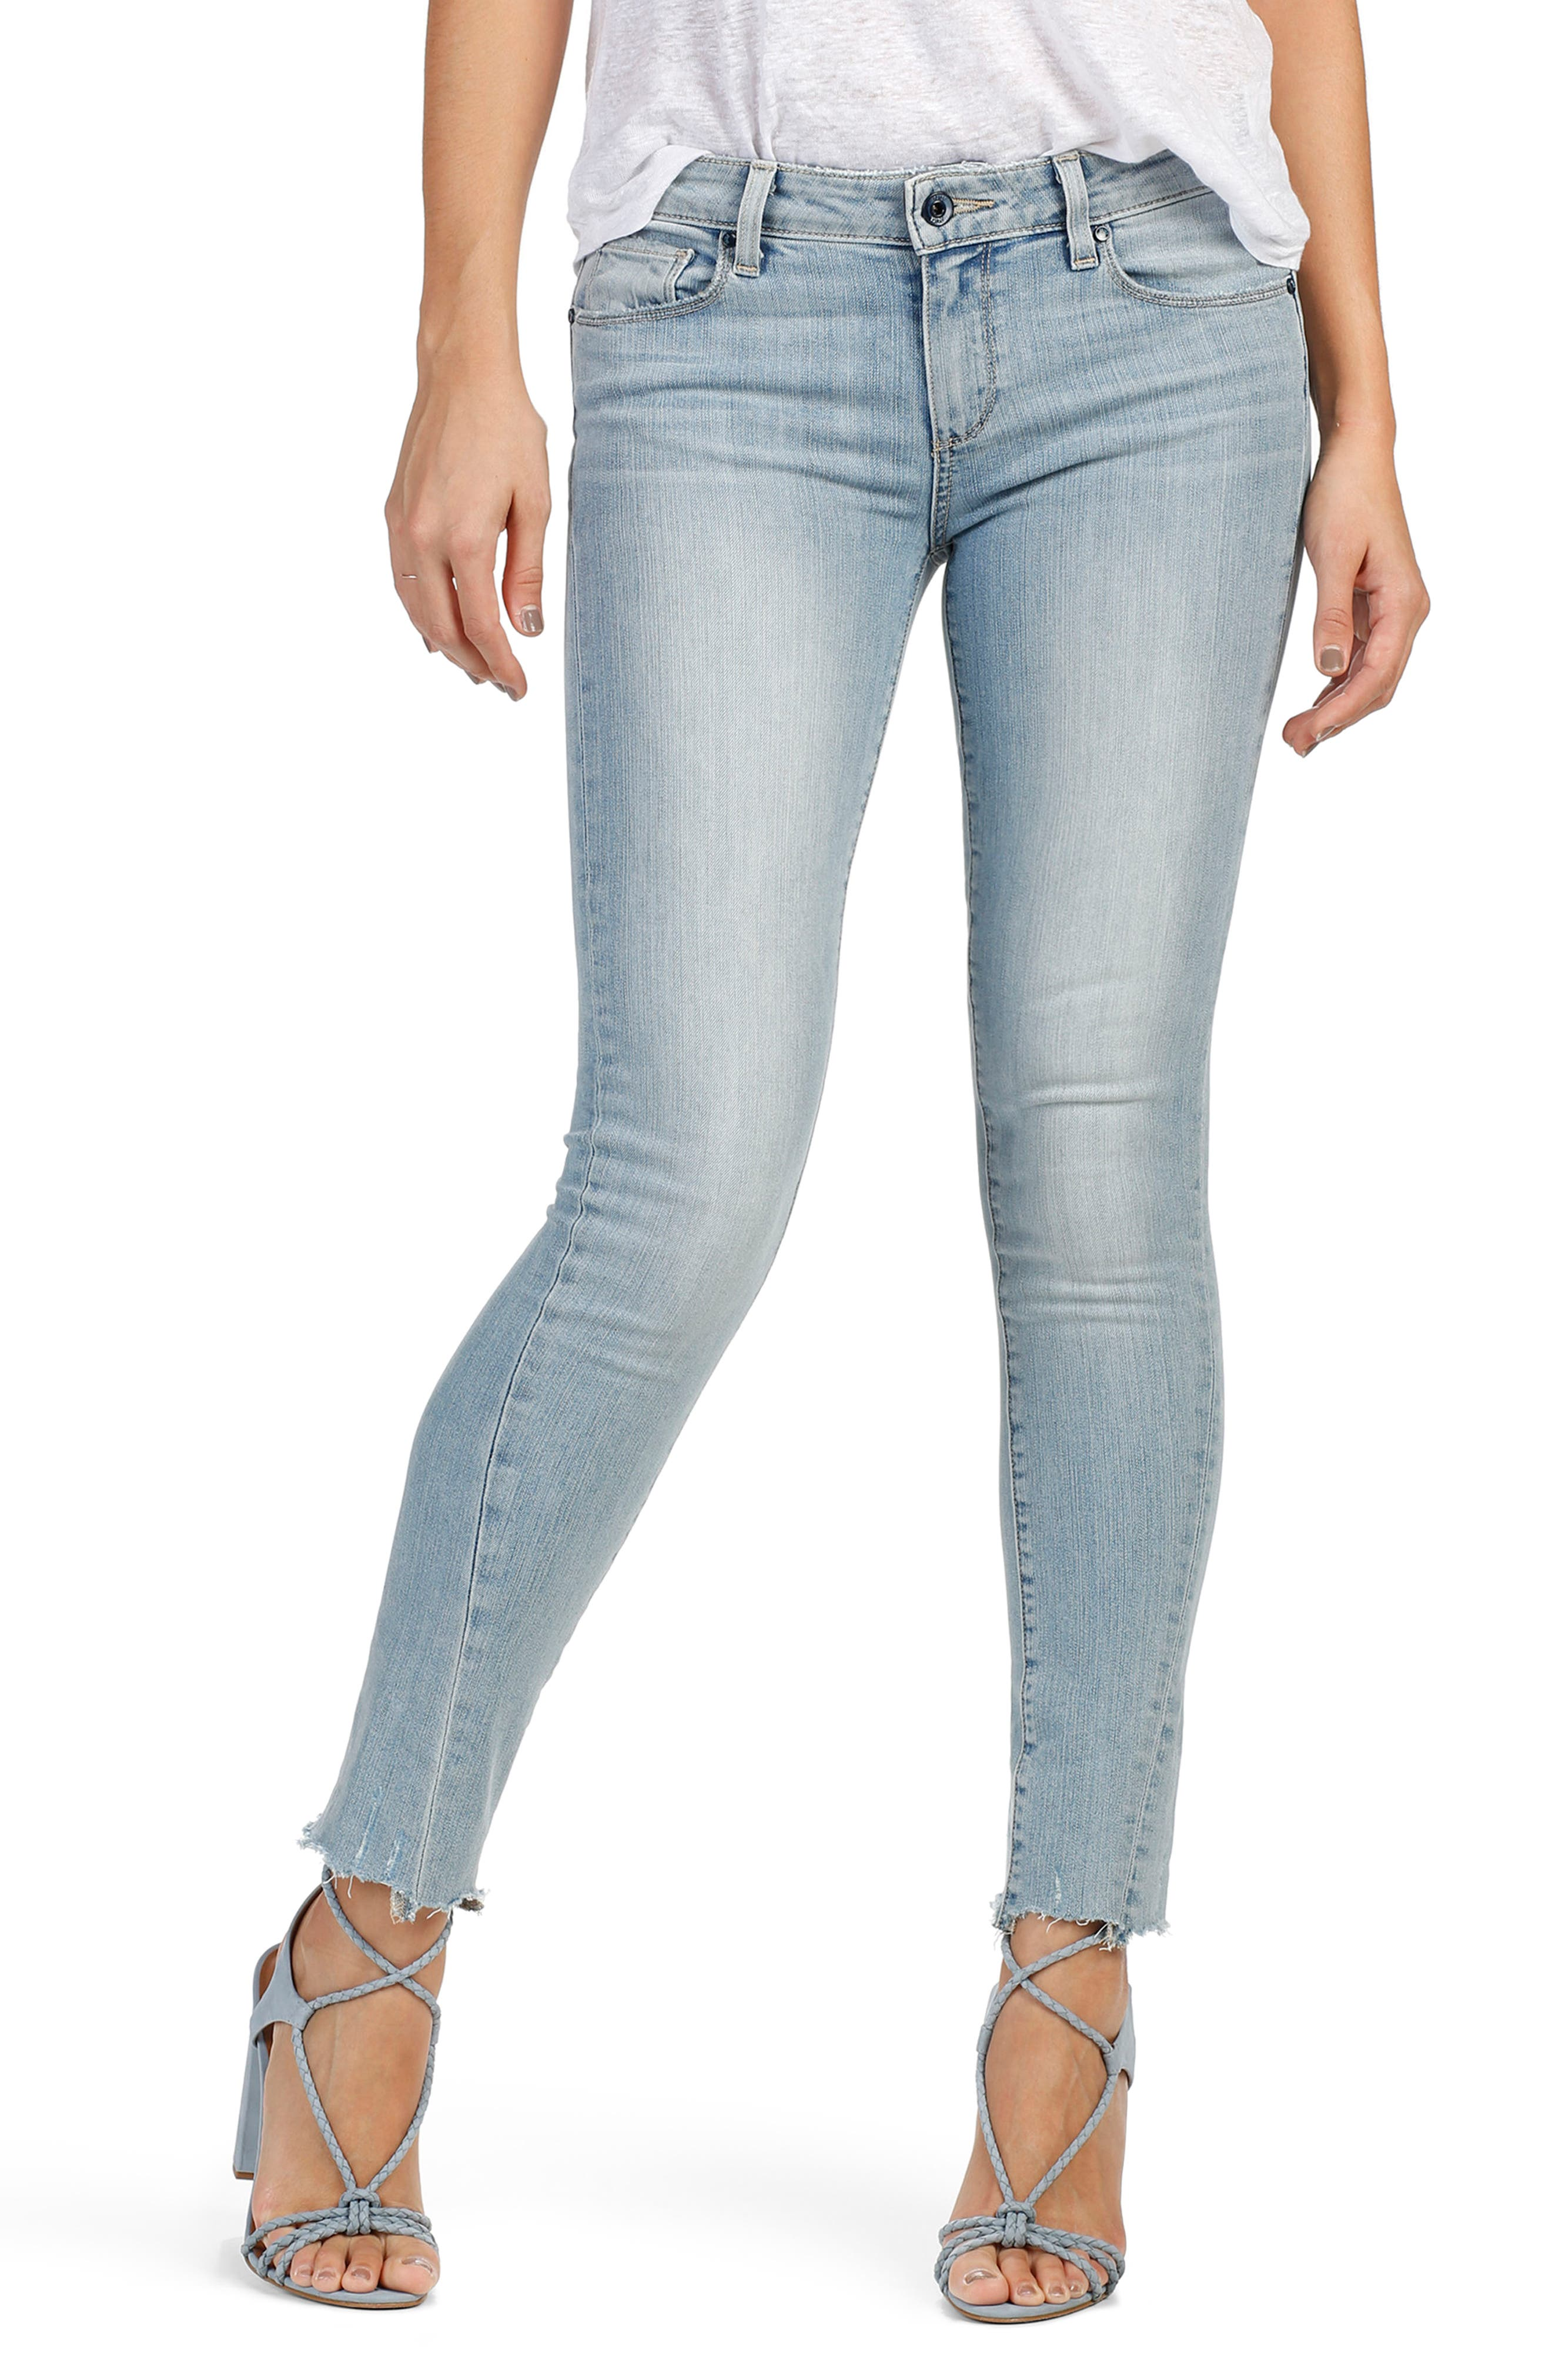 PAIGE Skyline Twisted Seam Ankle Peg Jeans